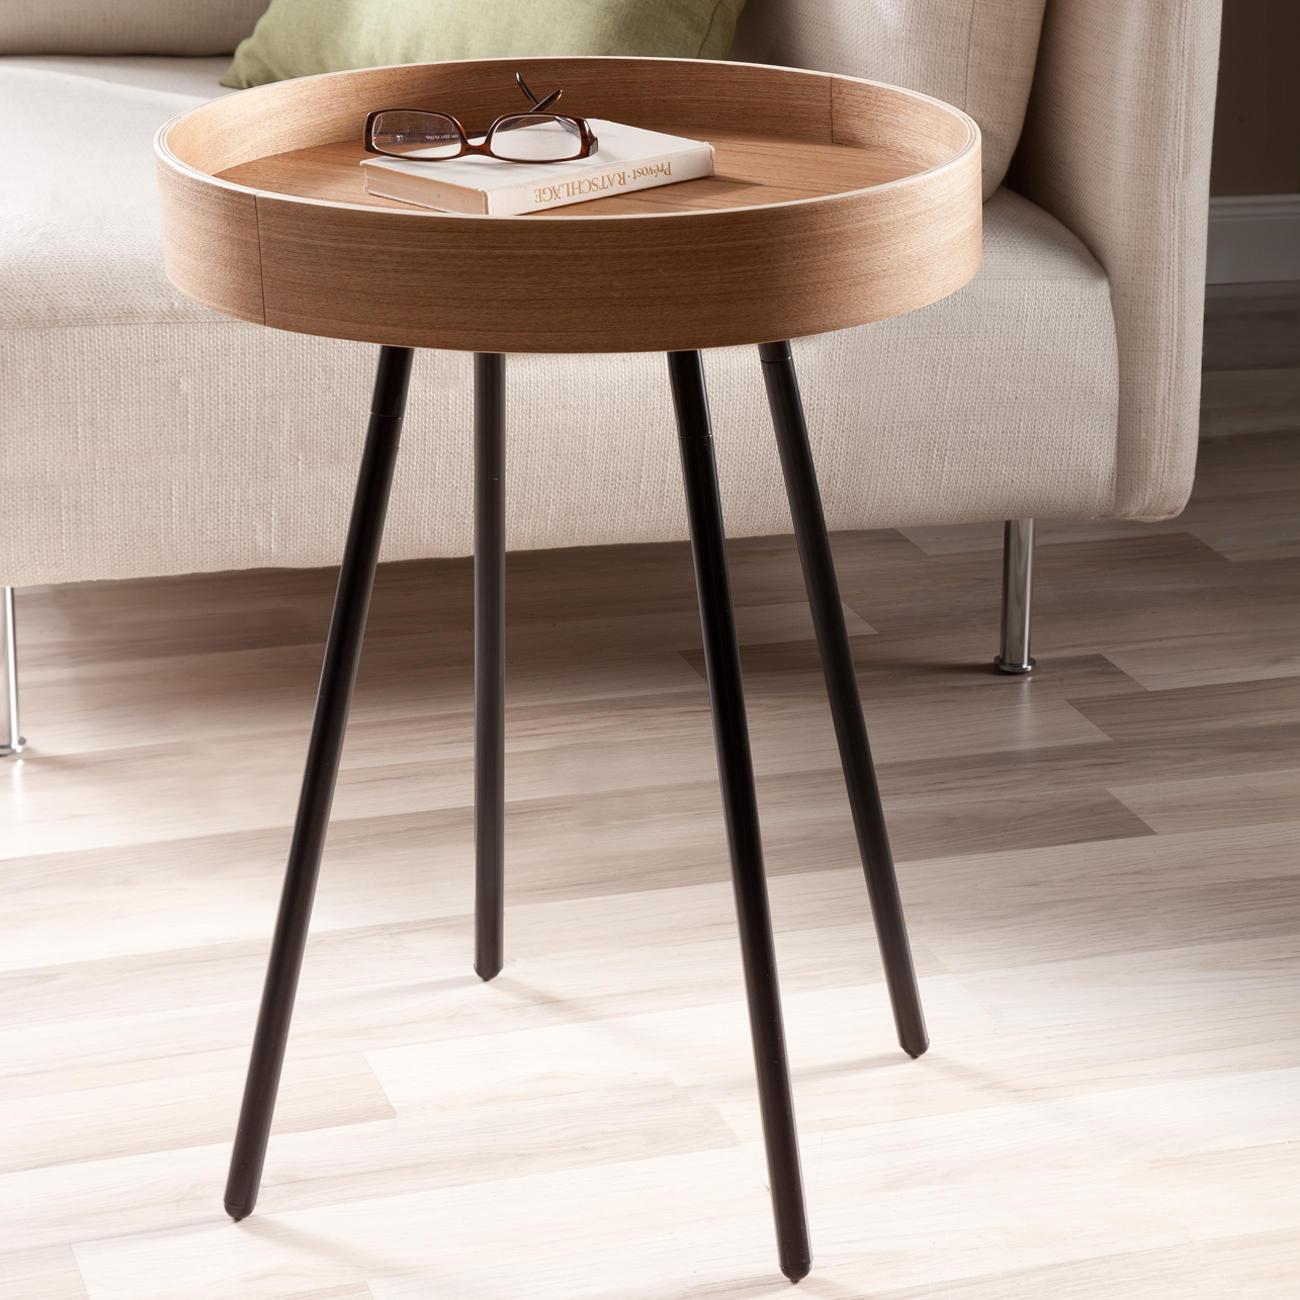 preisvergleich eu tablett tisch. Black Bedroom Furniture Sets. Home Design Ideas